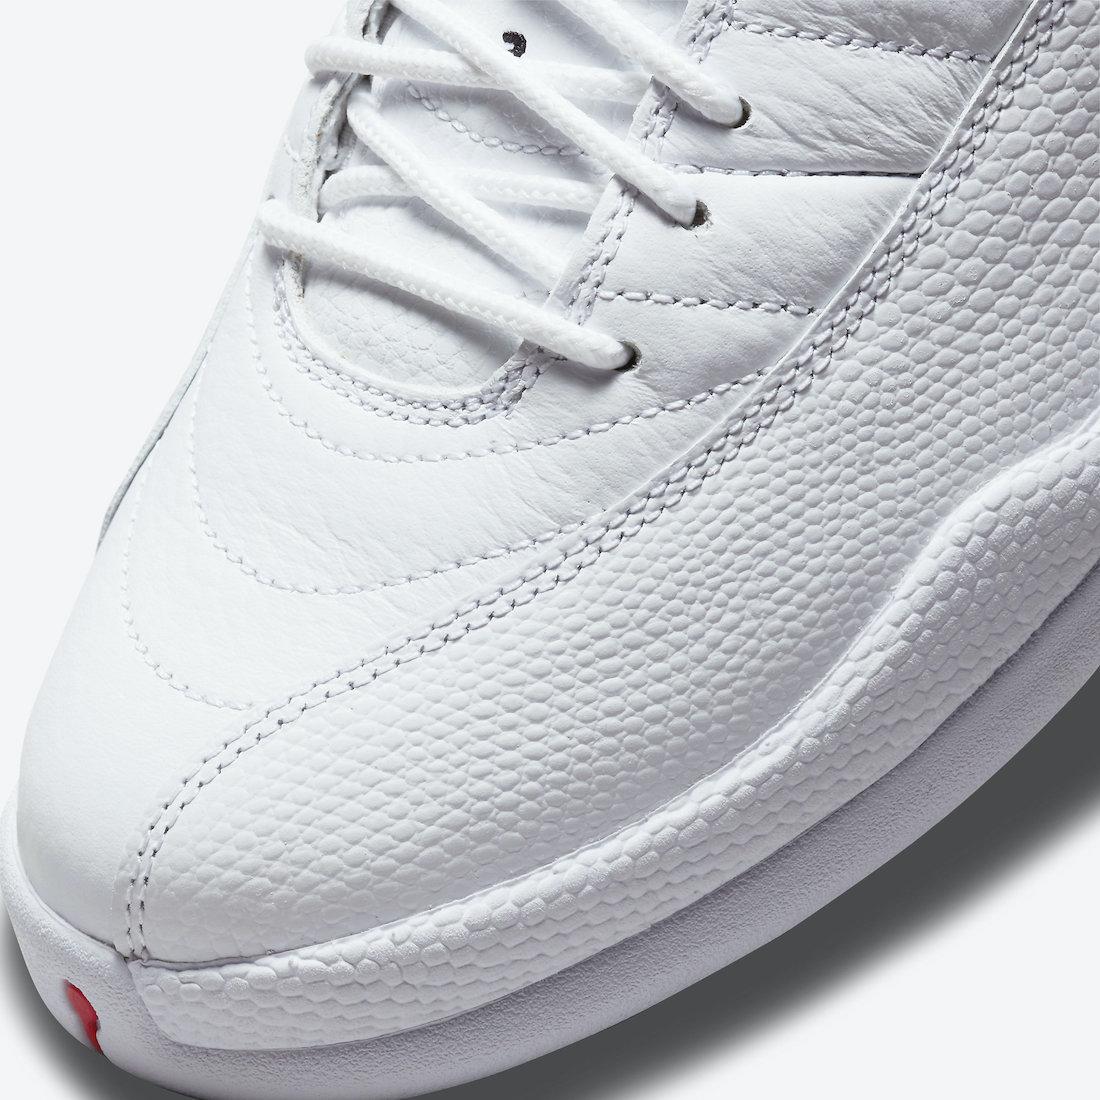 Air-Jordan-12-Twist-White-University-Red-CT8013-106-Release-Date-Price-6